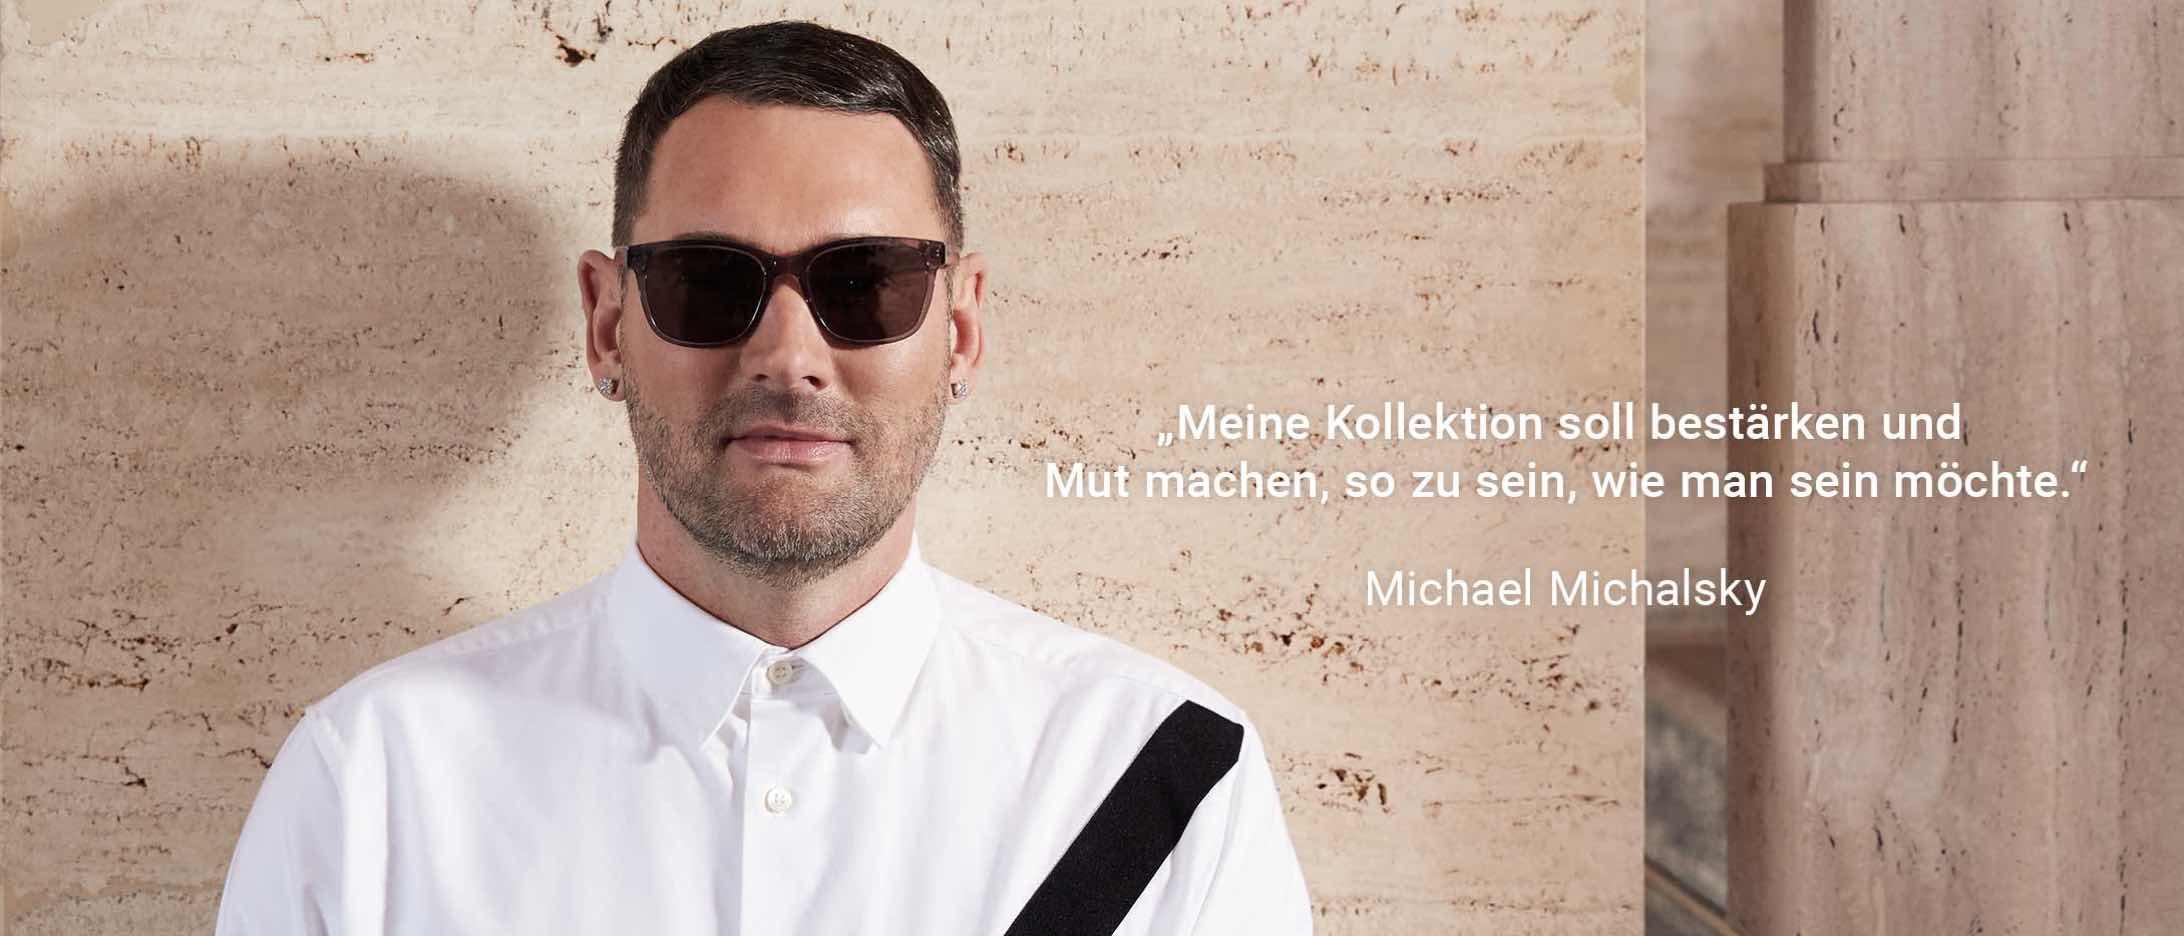 Michalsky - No regrets